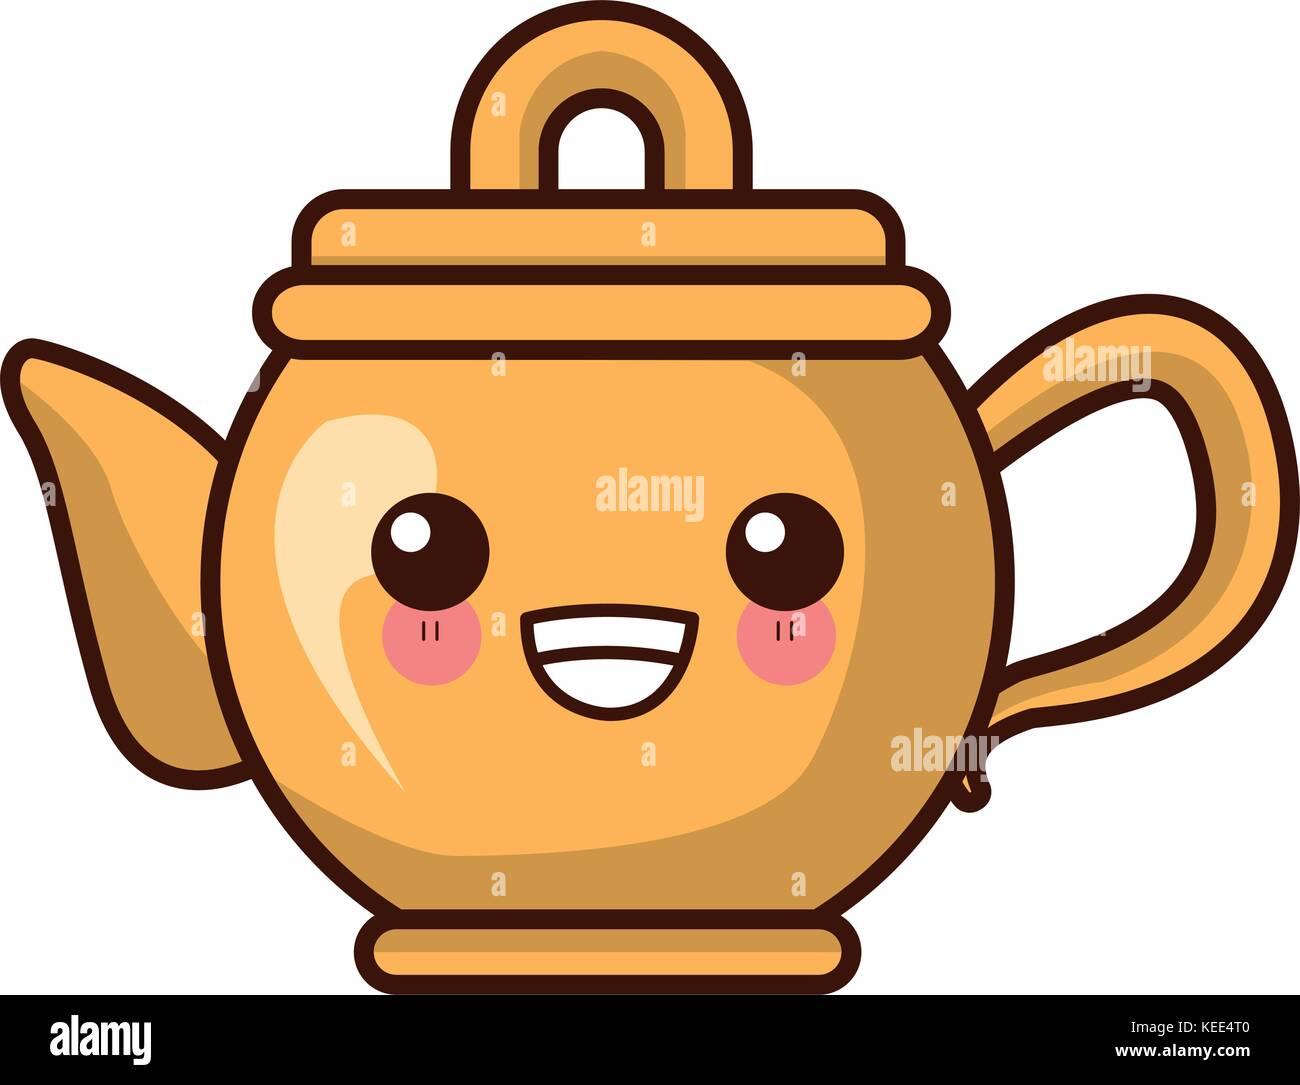 Porcelain Teapot Utensil Kawaii Cute Cartoon Stock Vector Art